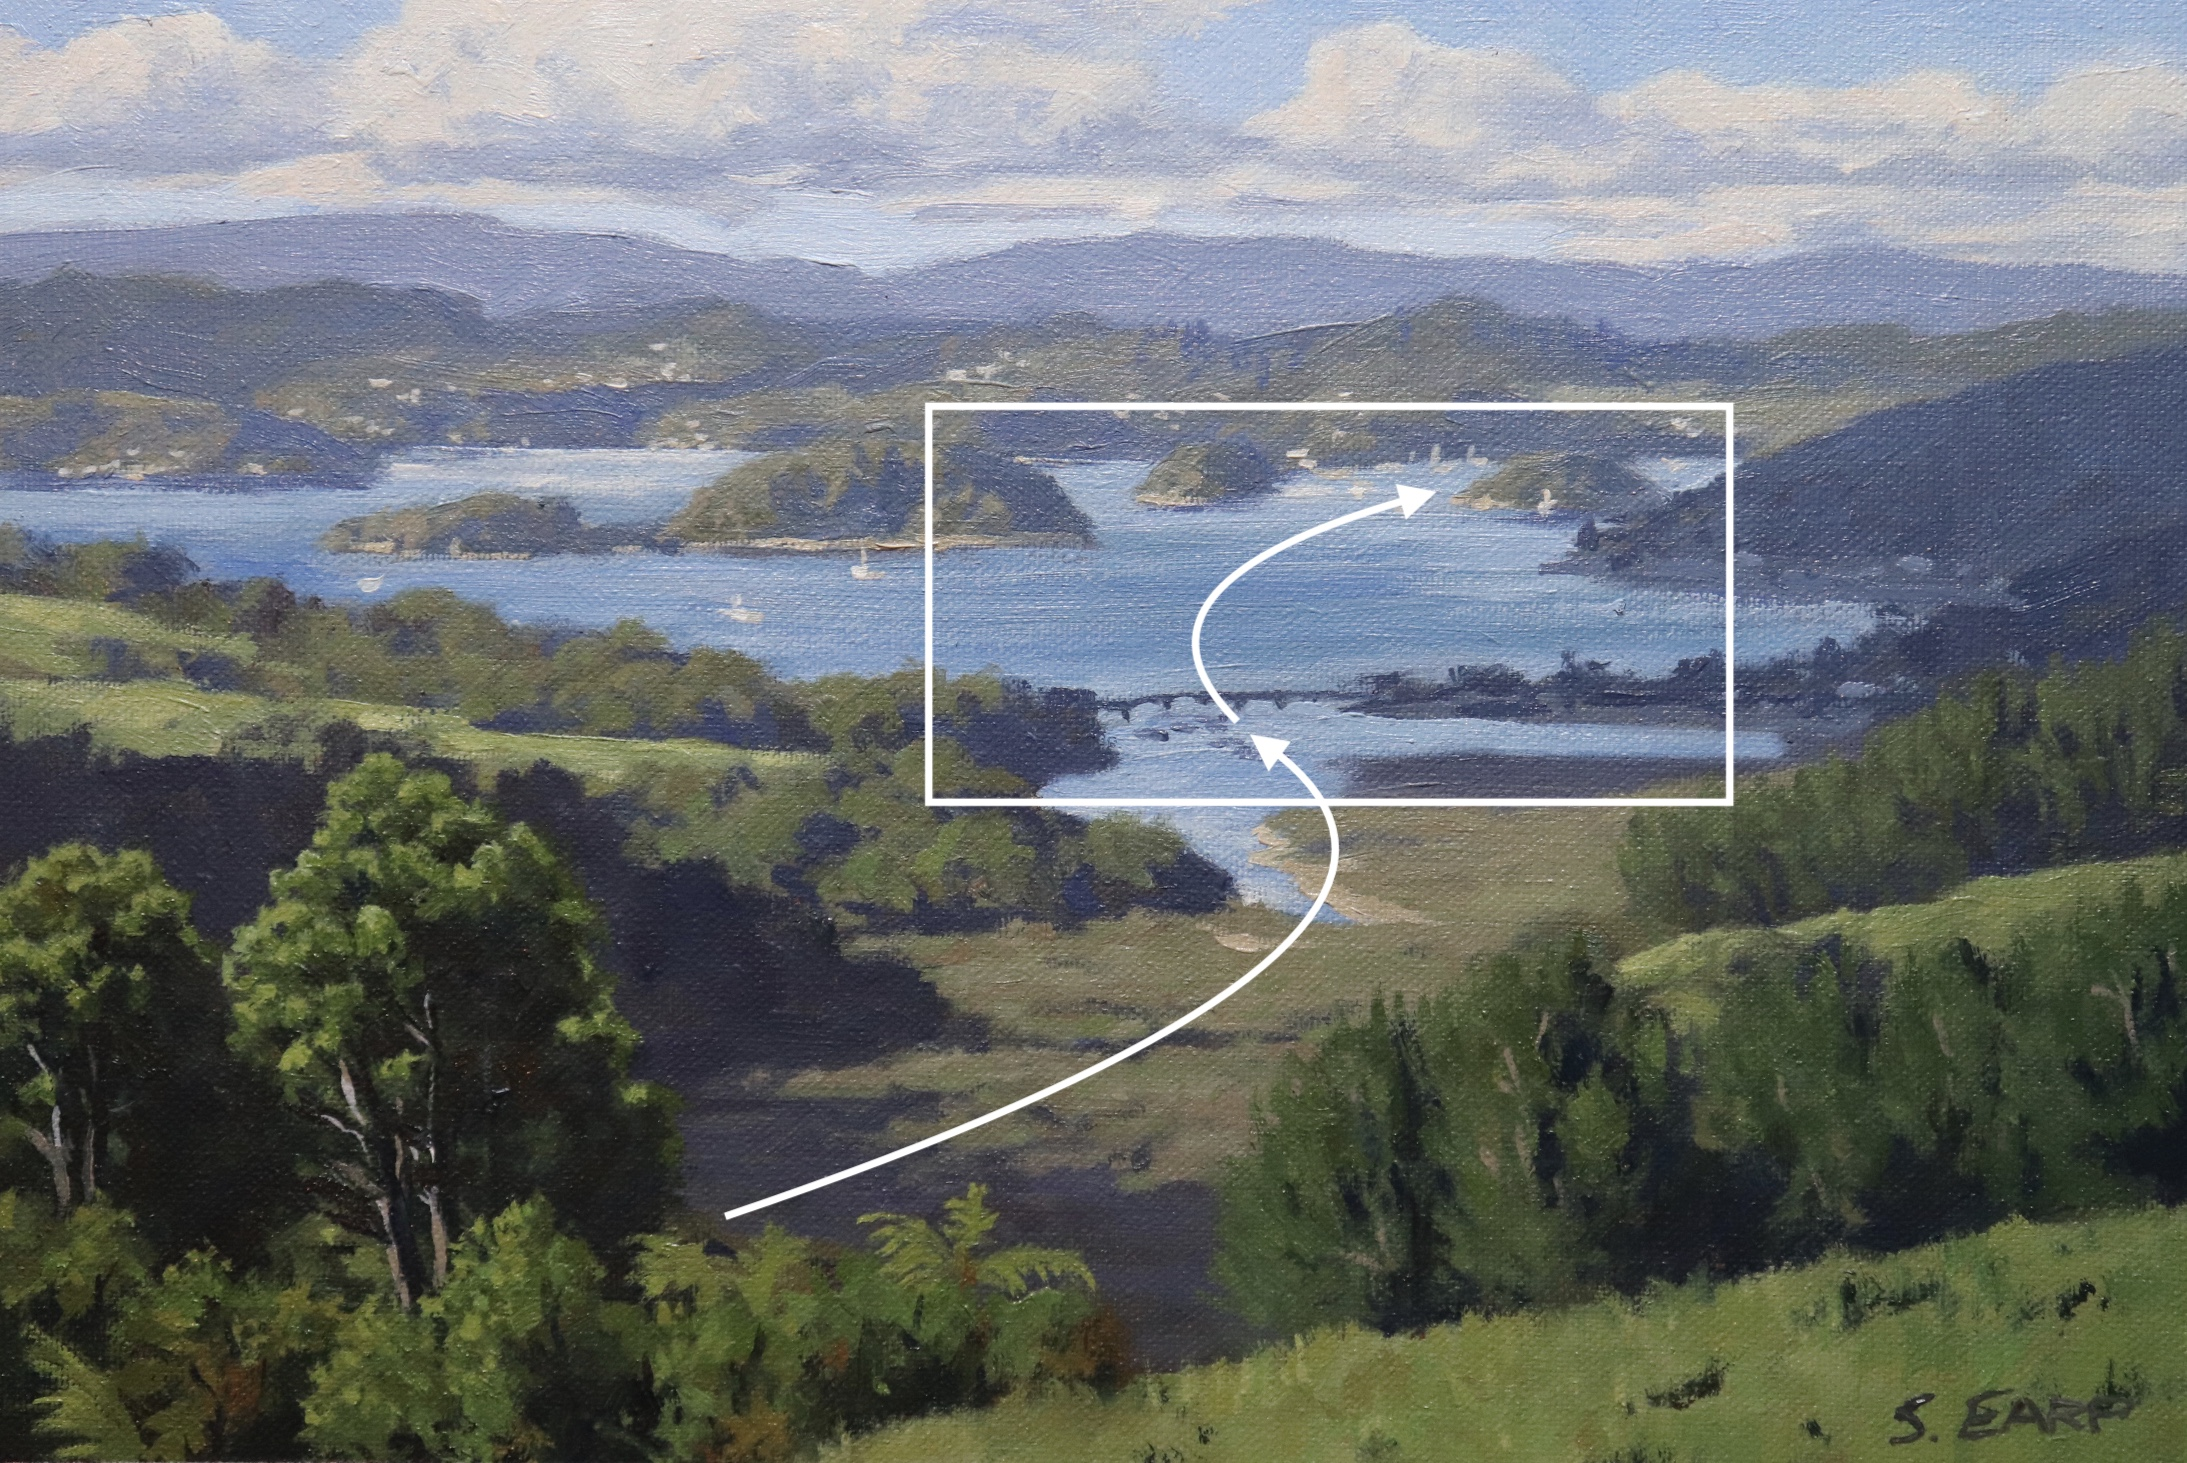 Bay of Islands - New Zealand - Samuel Earp - Oil Painting composition.jpg